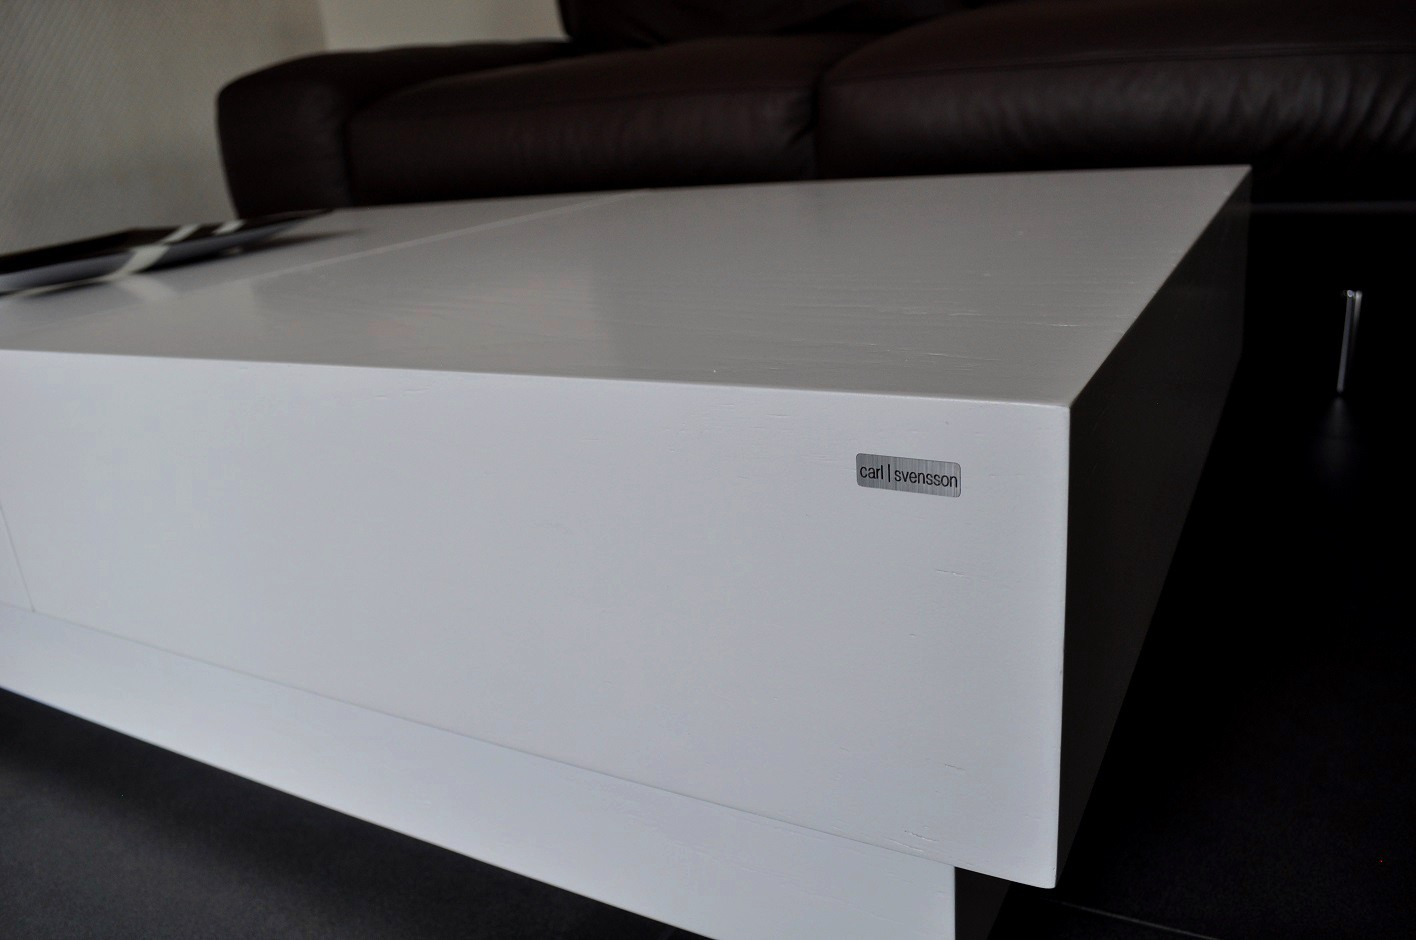 couchtisch wei carl svensson. Black Bedroom Furniture Sets. Home Design Ideas